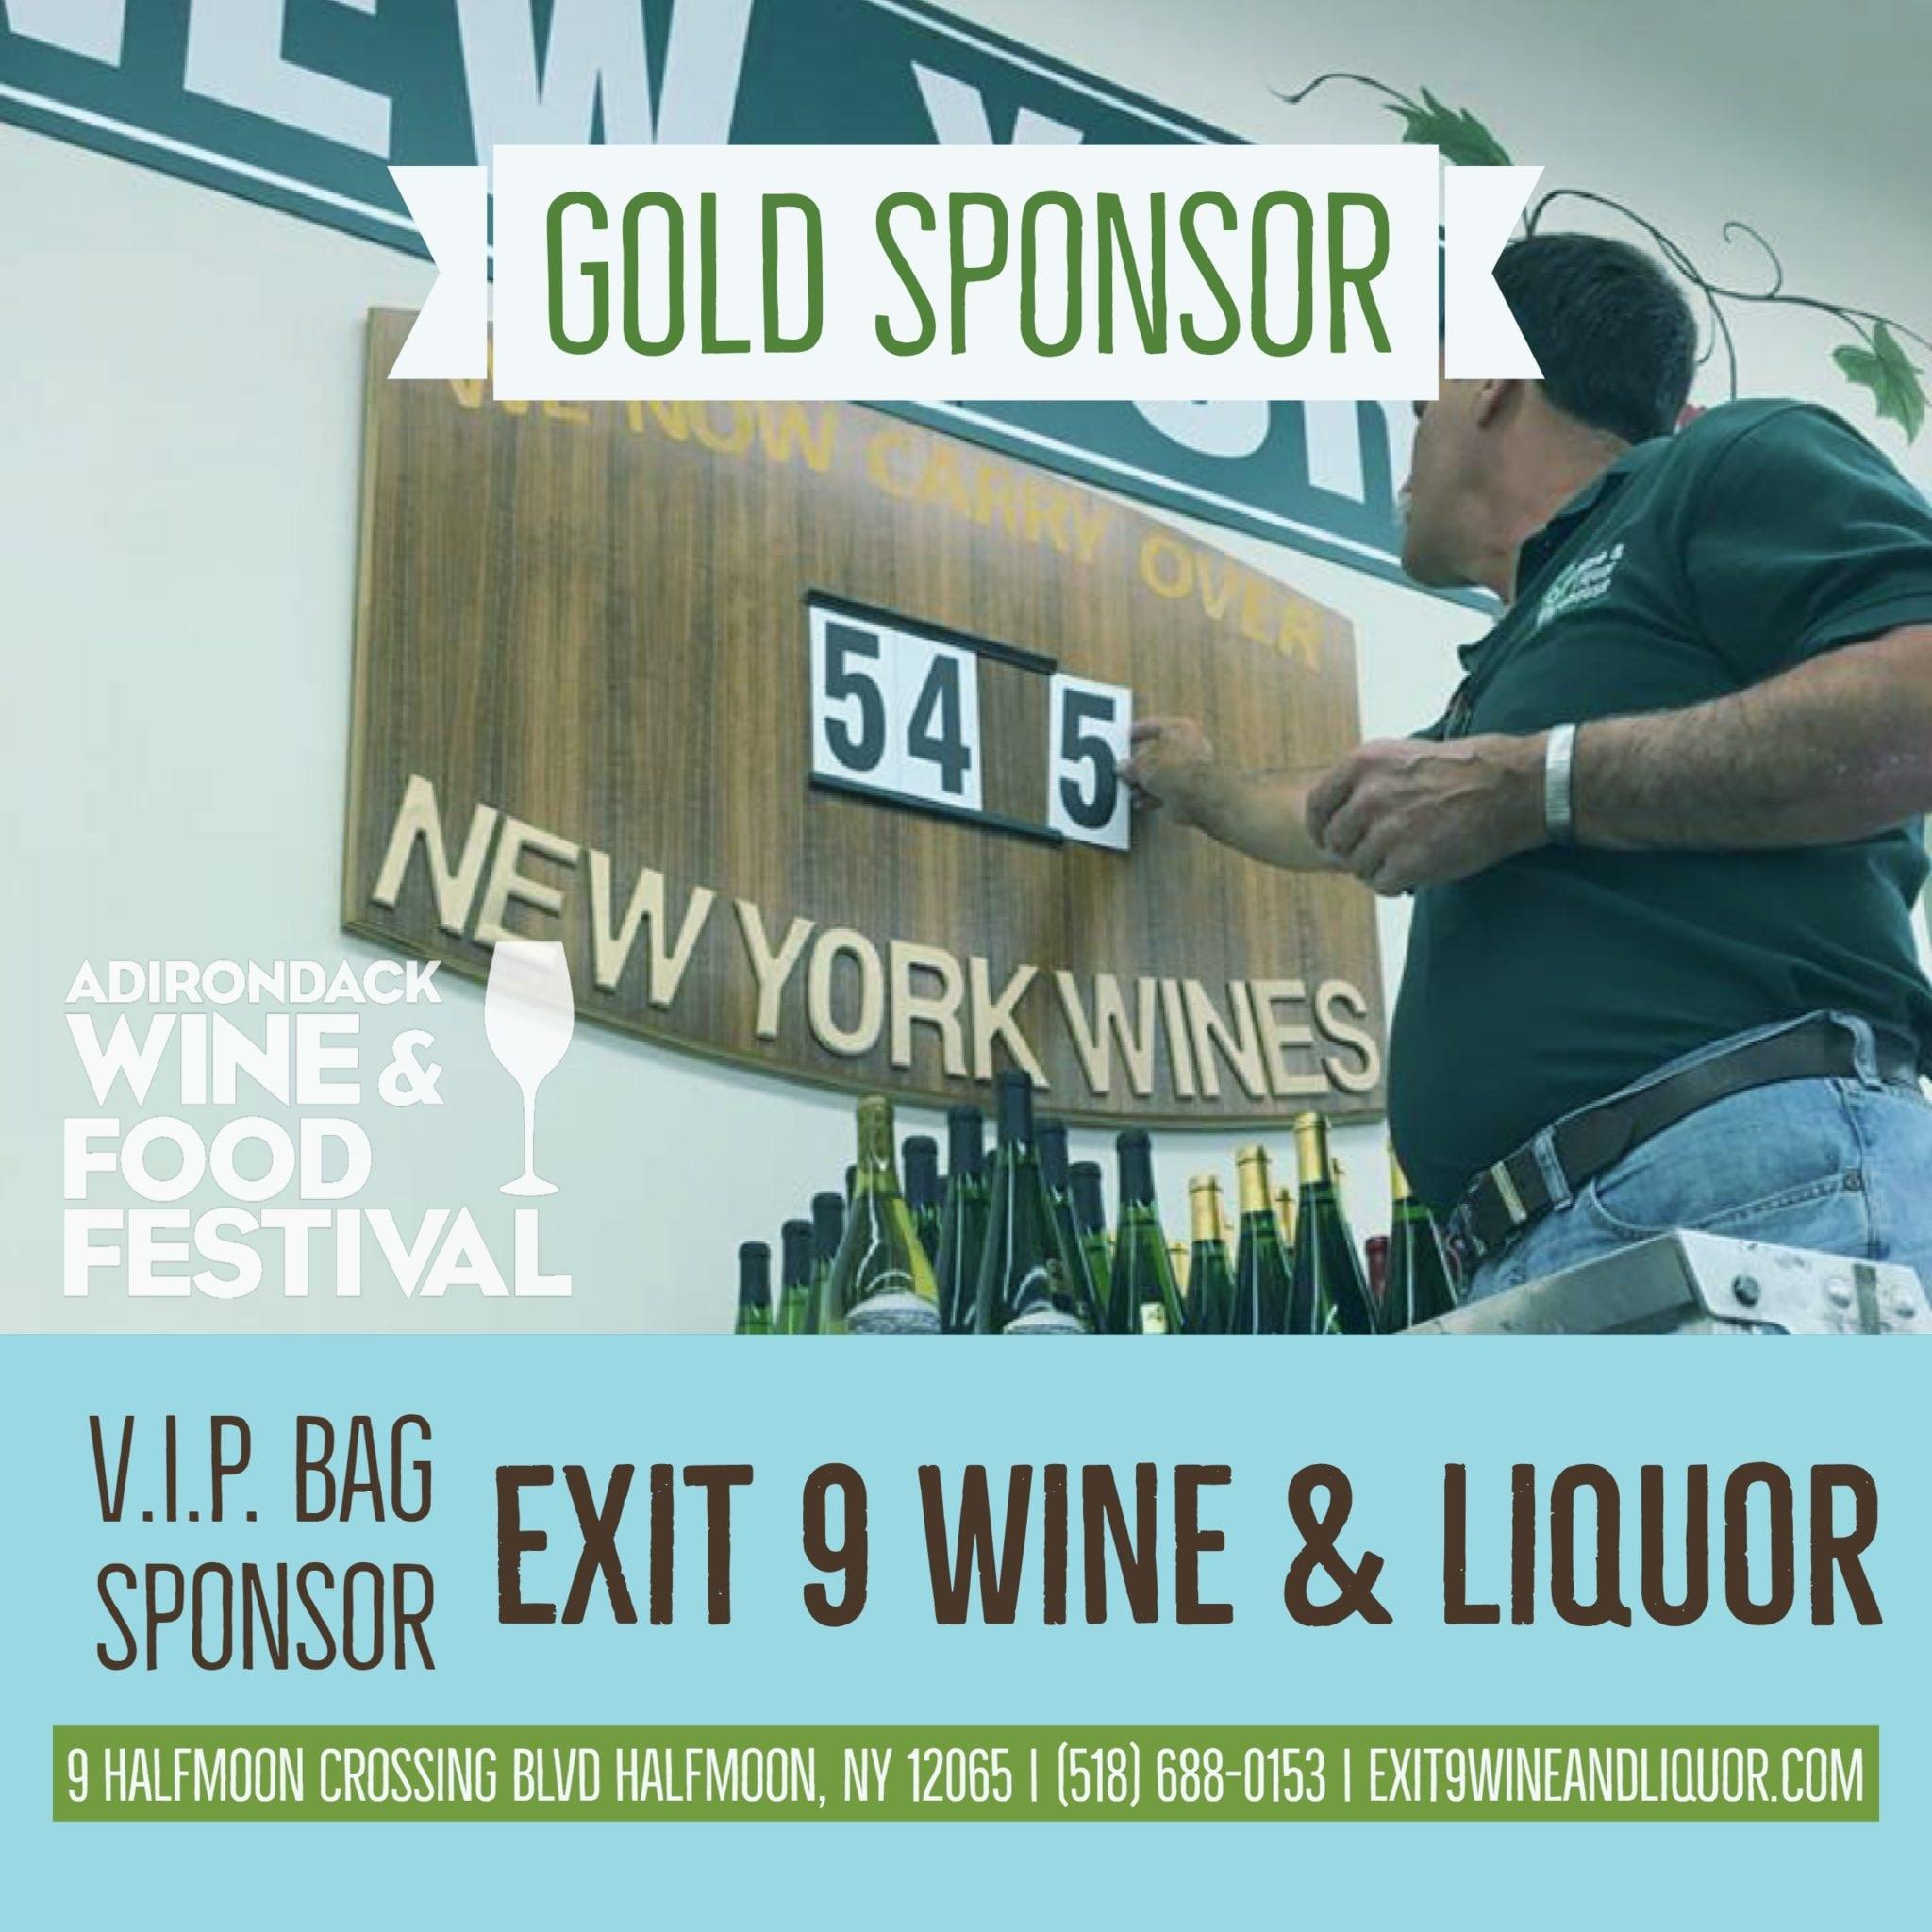 Exit 9 Wine and Liquor